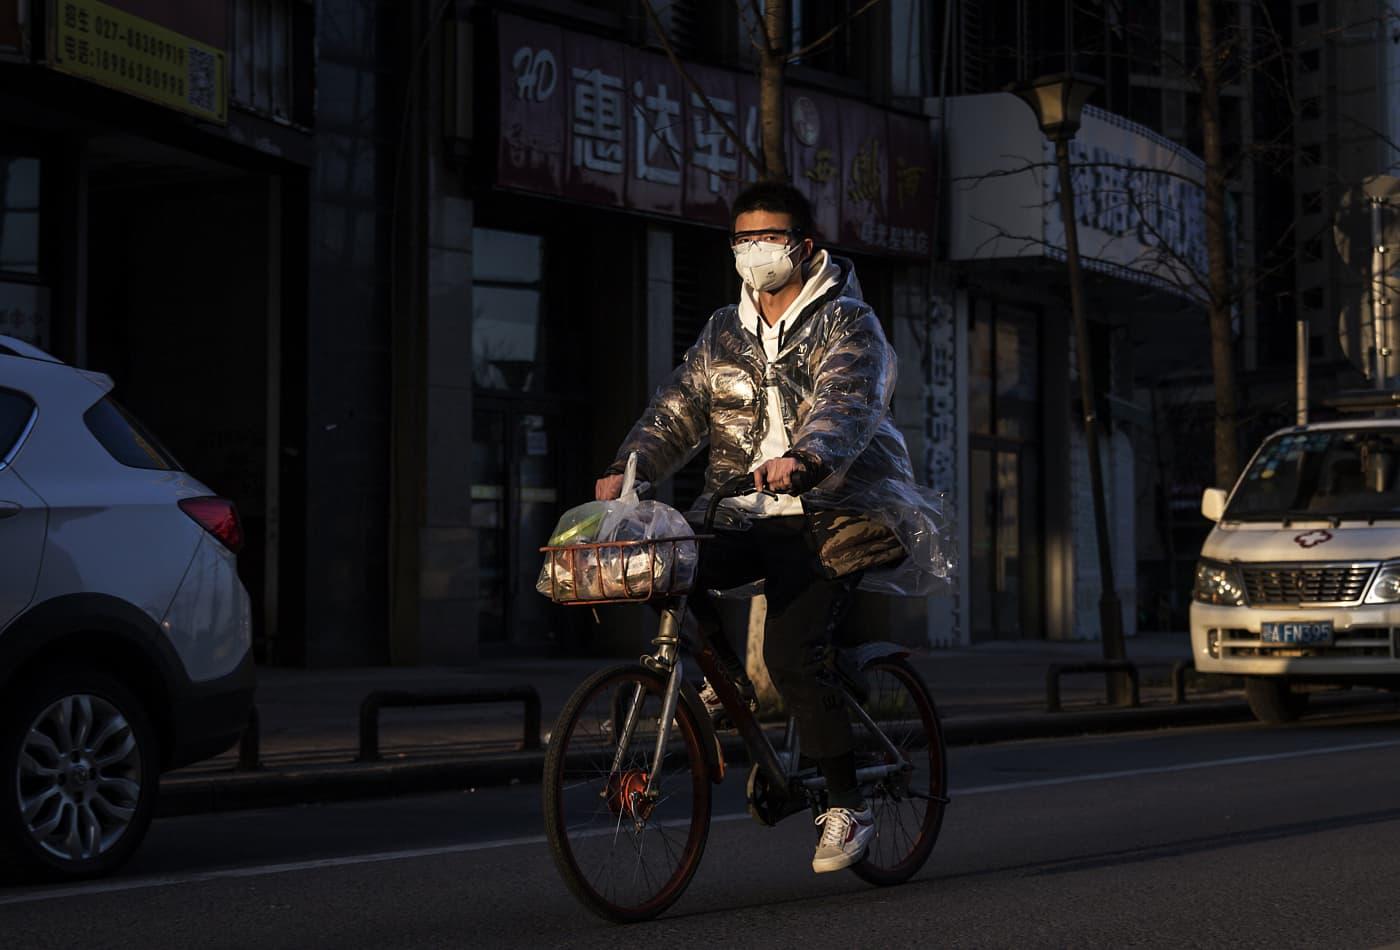 Coronavirus live updates: Director of hospital in Wuhan, China dies